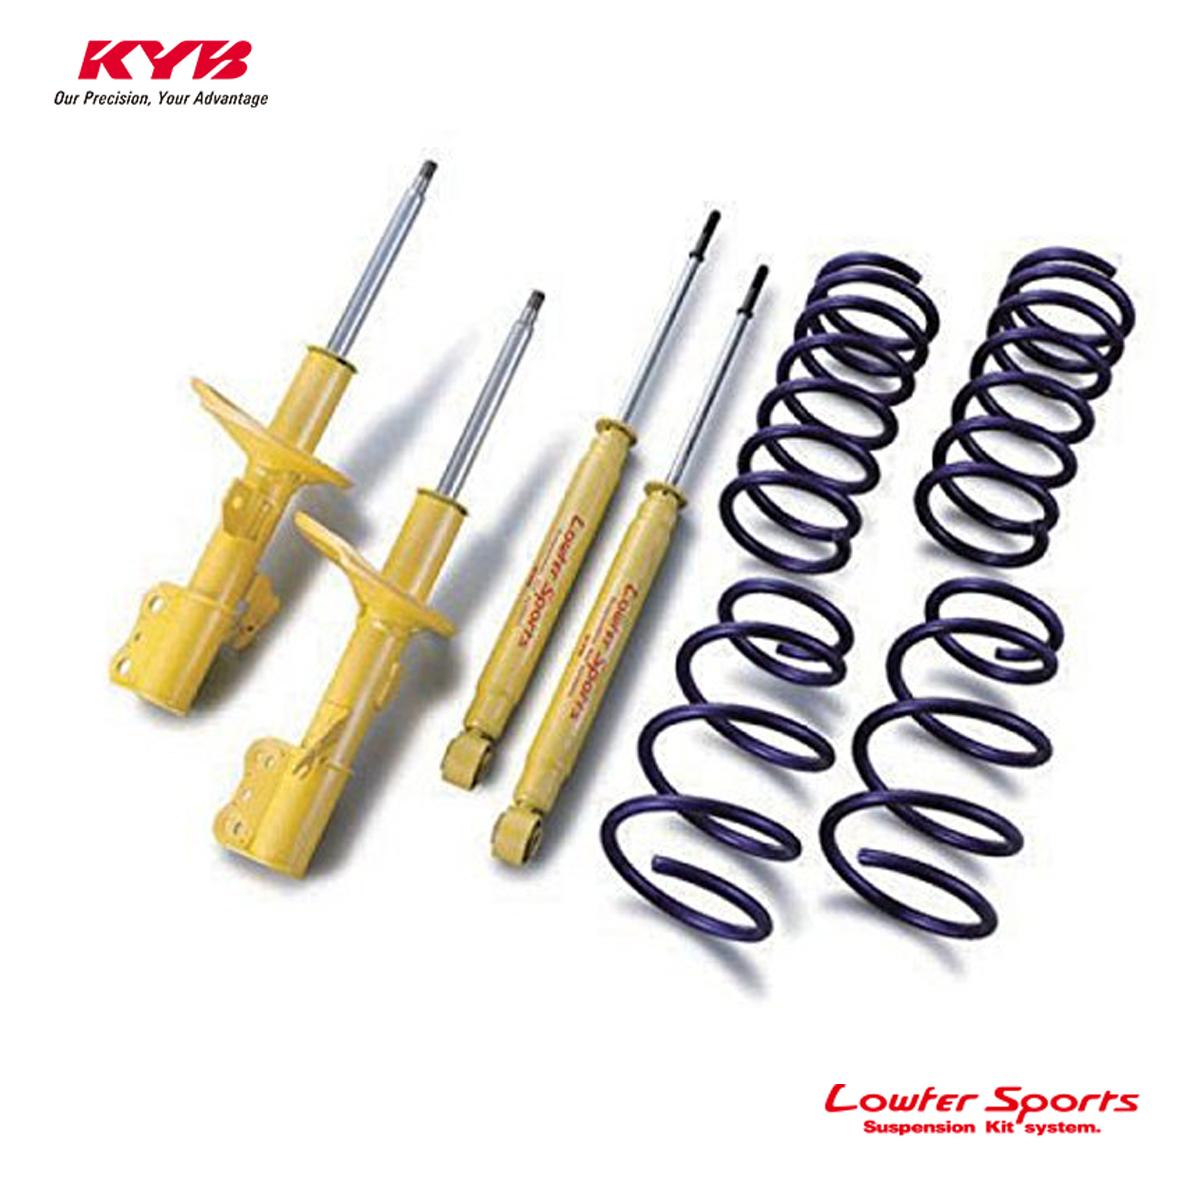 KYB カヤバ プリウス ZVW30 ショックアブソーバー サスペンションキット Lowfer Sports LKIT-ZVW307 配送先条件有り